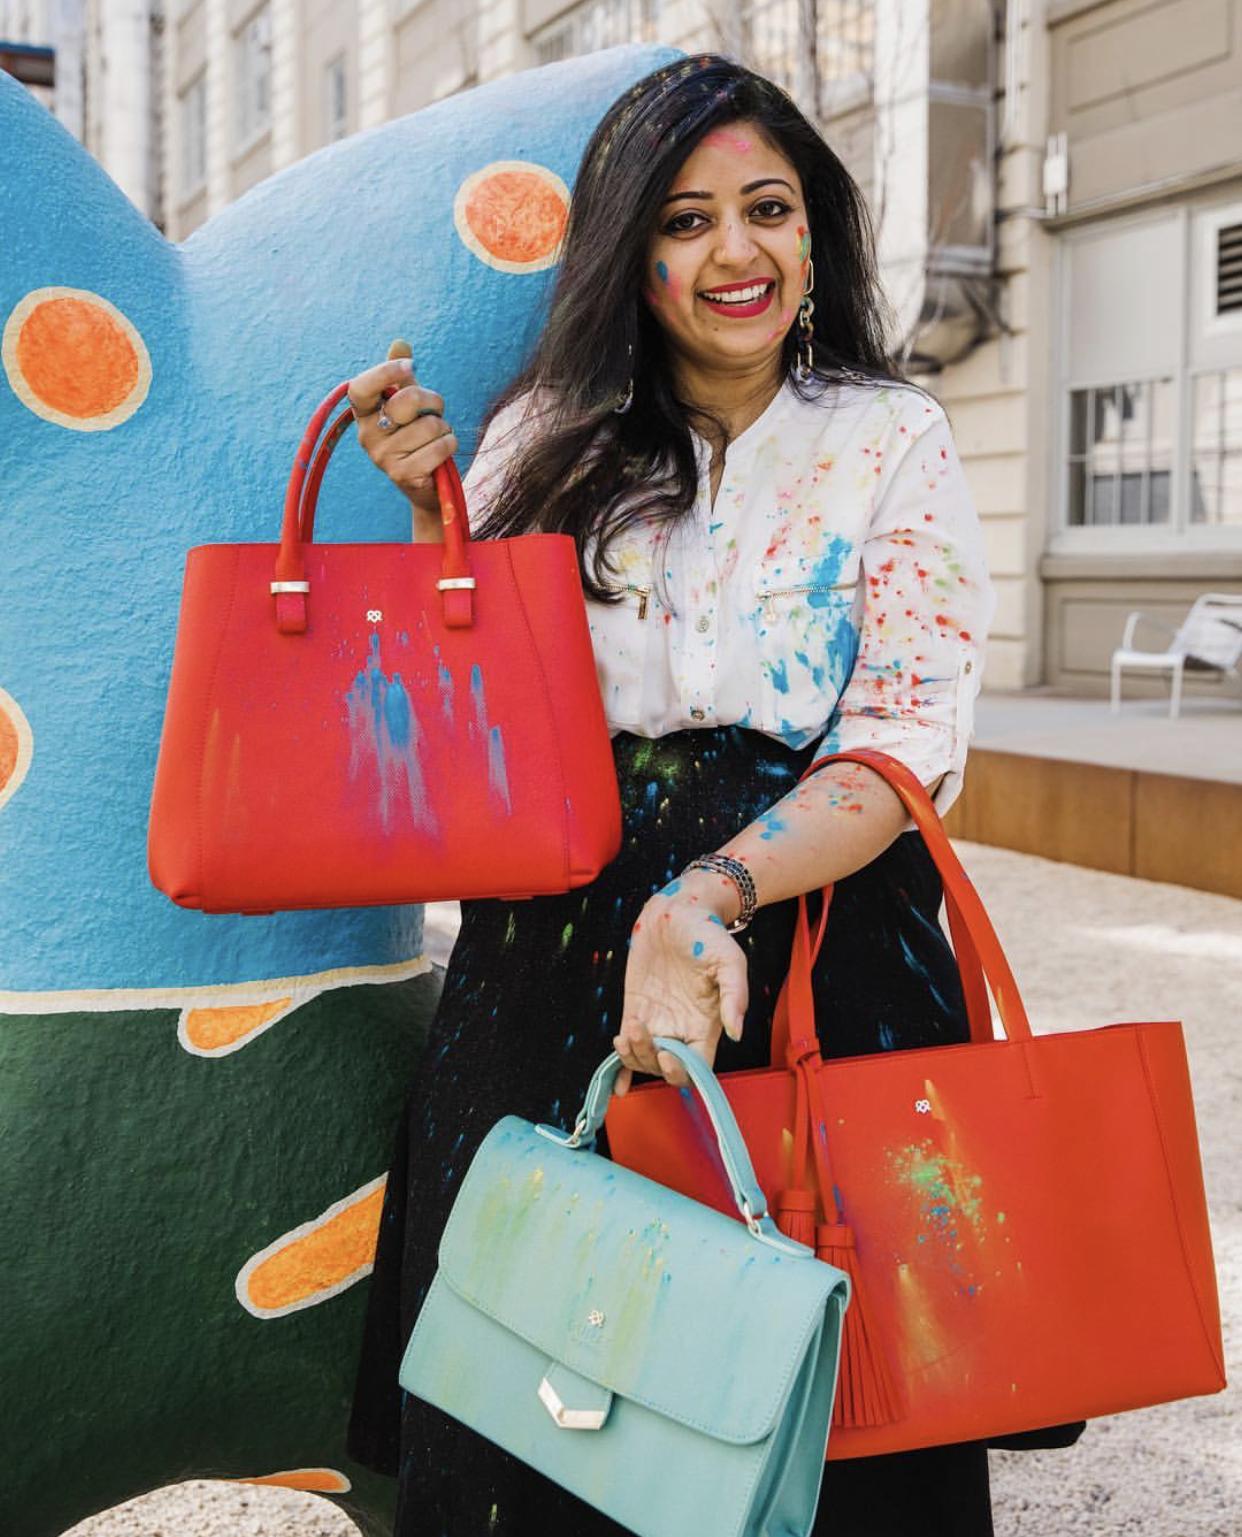 Designer Sugandh G. Agrawal with her GUNAS bags.